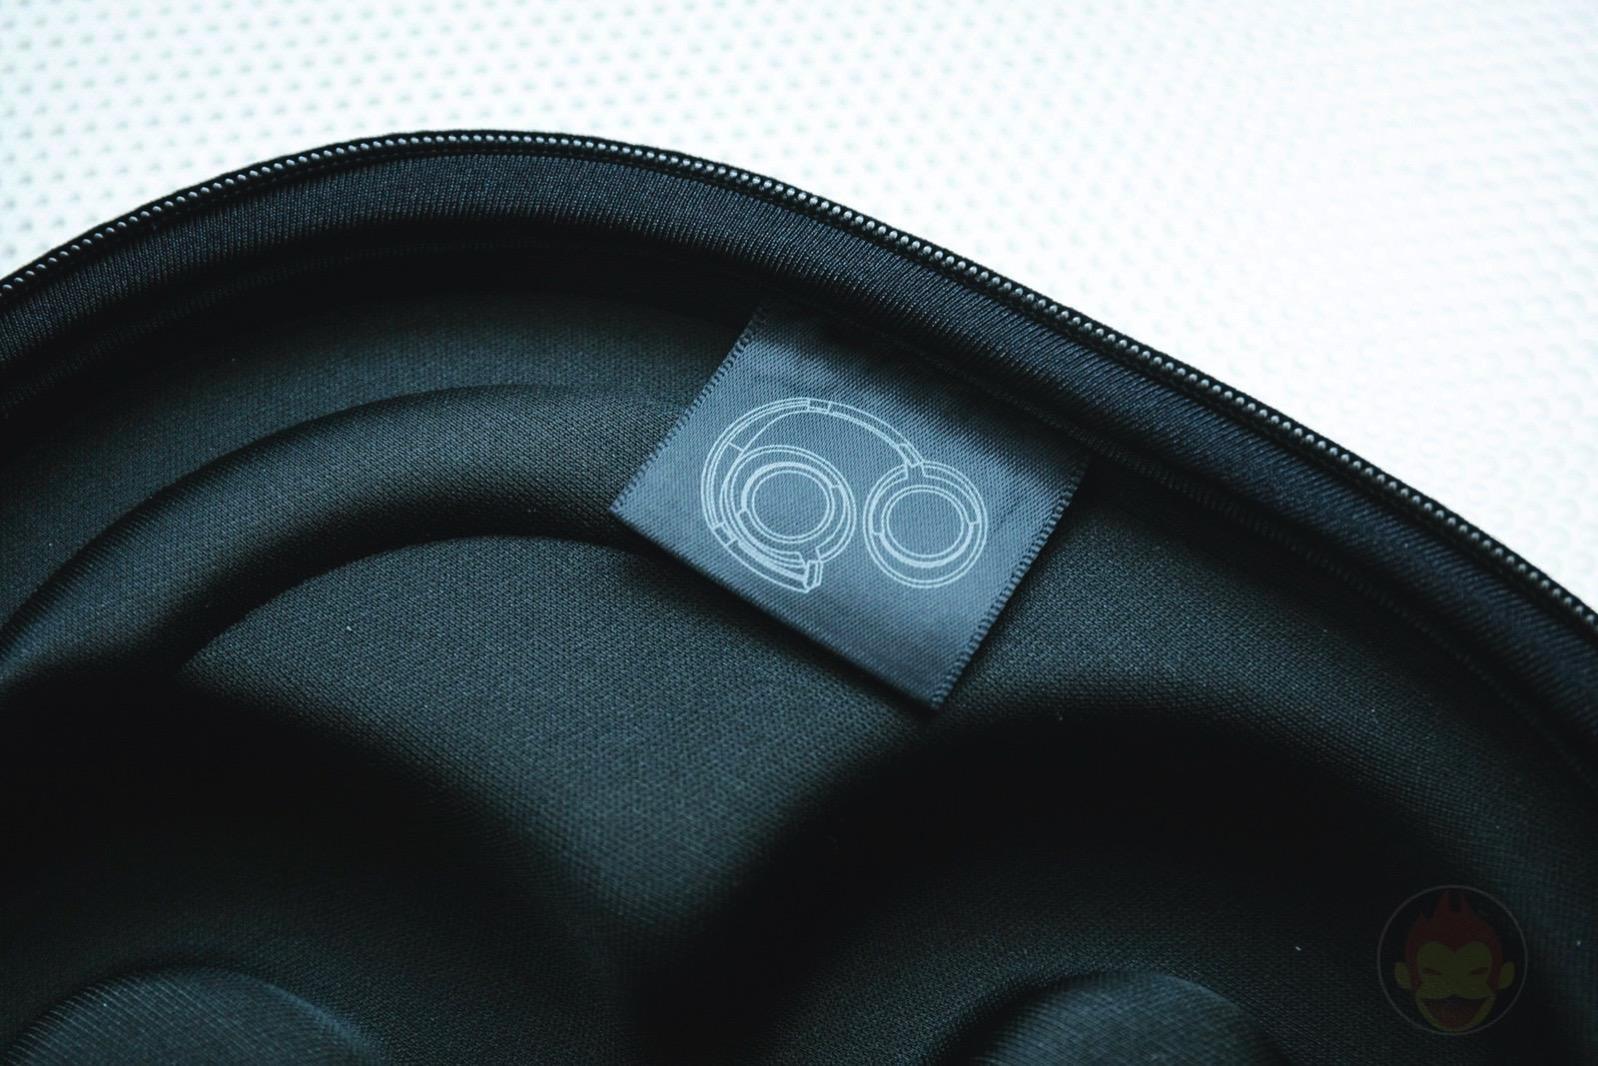 Soundcore-Space-NC-Wireless-Headphones-03.jpg